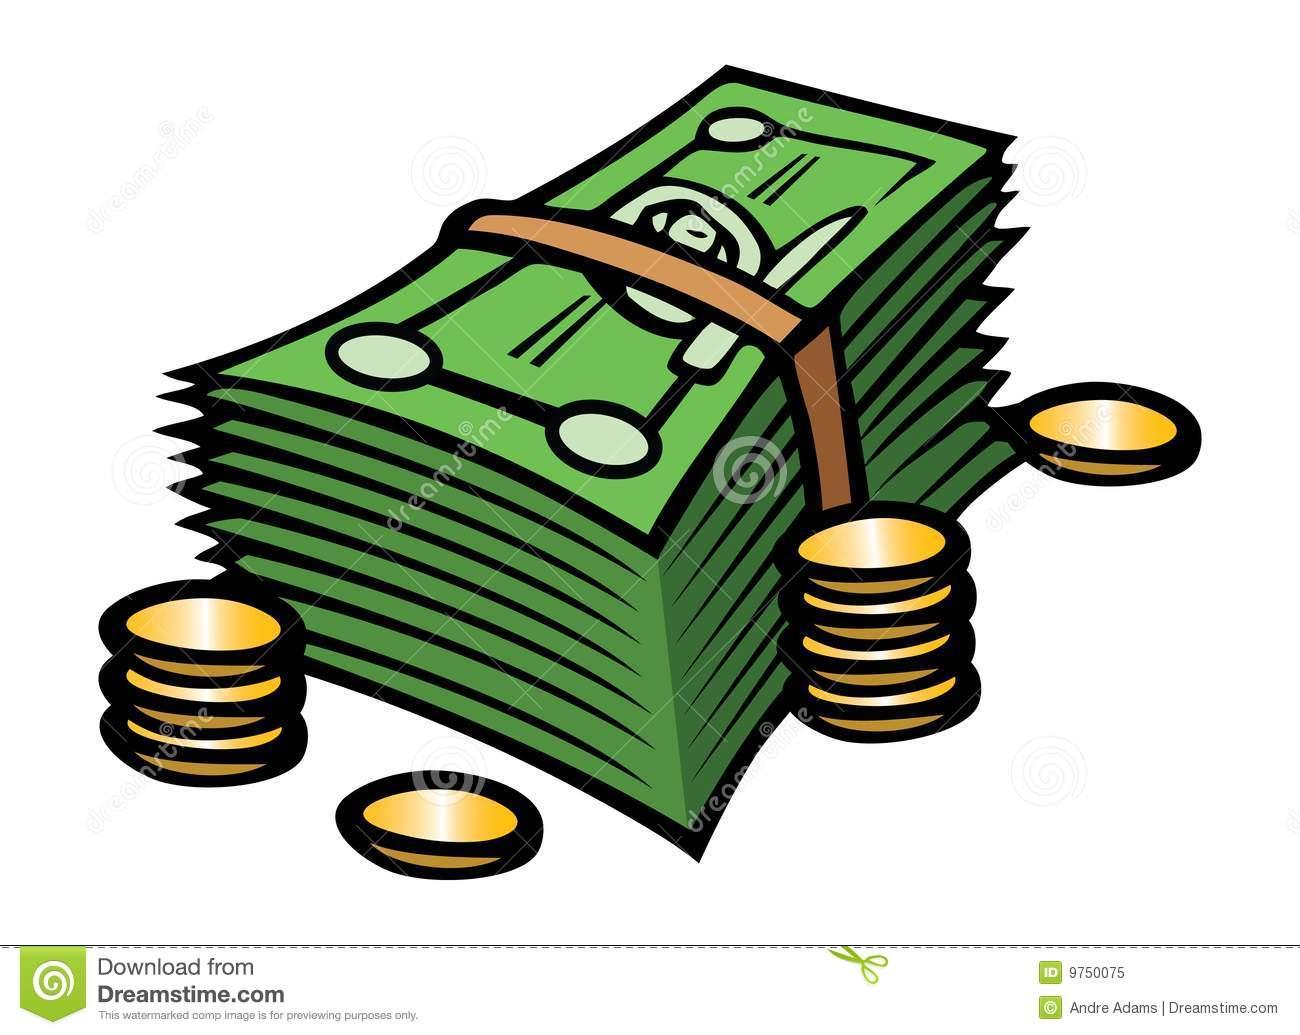 Cartoon Money Clipart - Clipart Kid